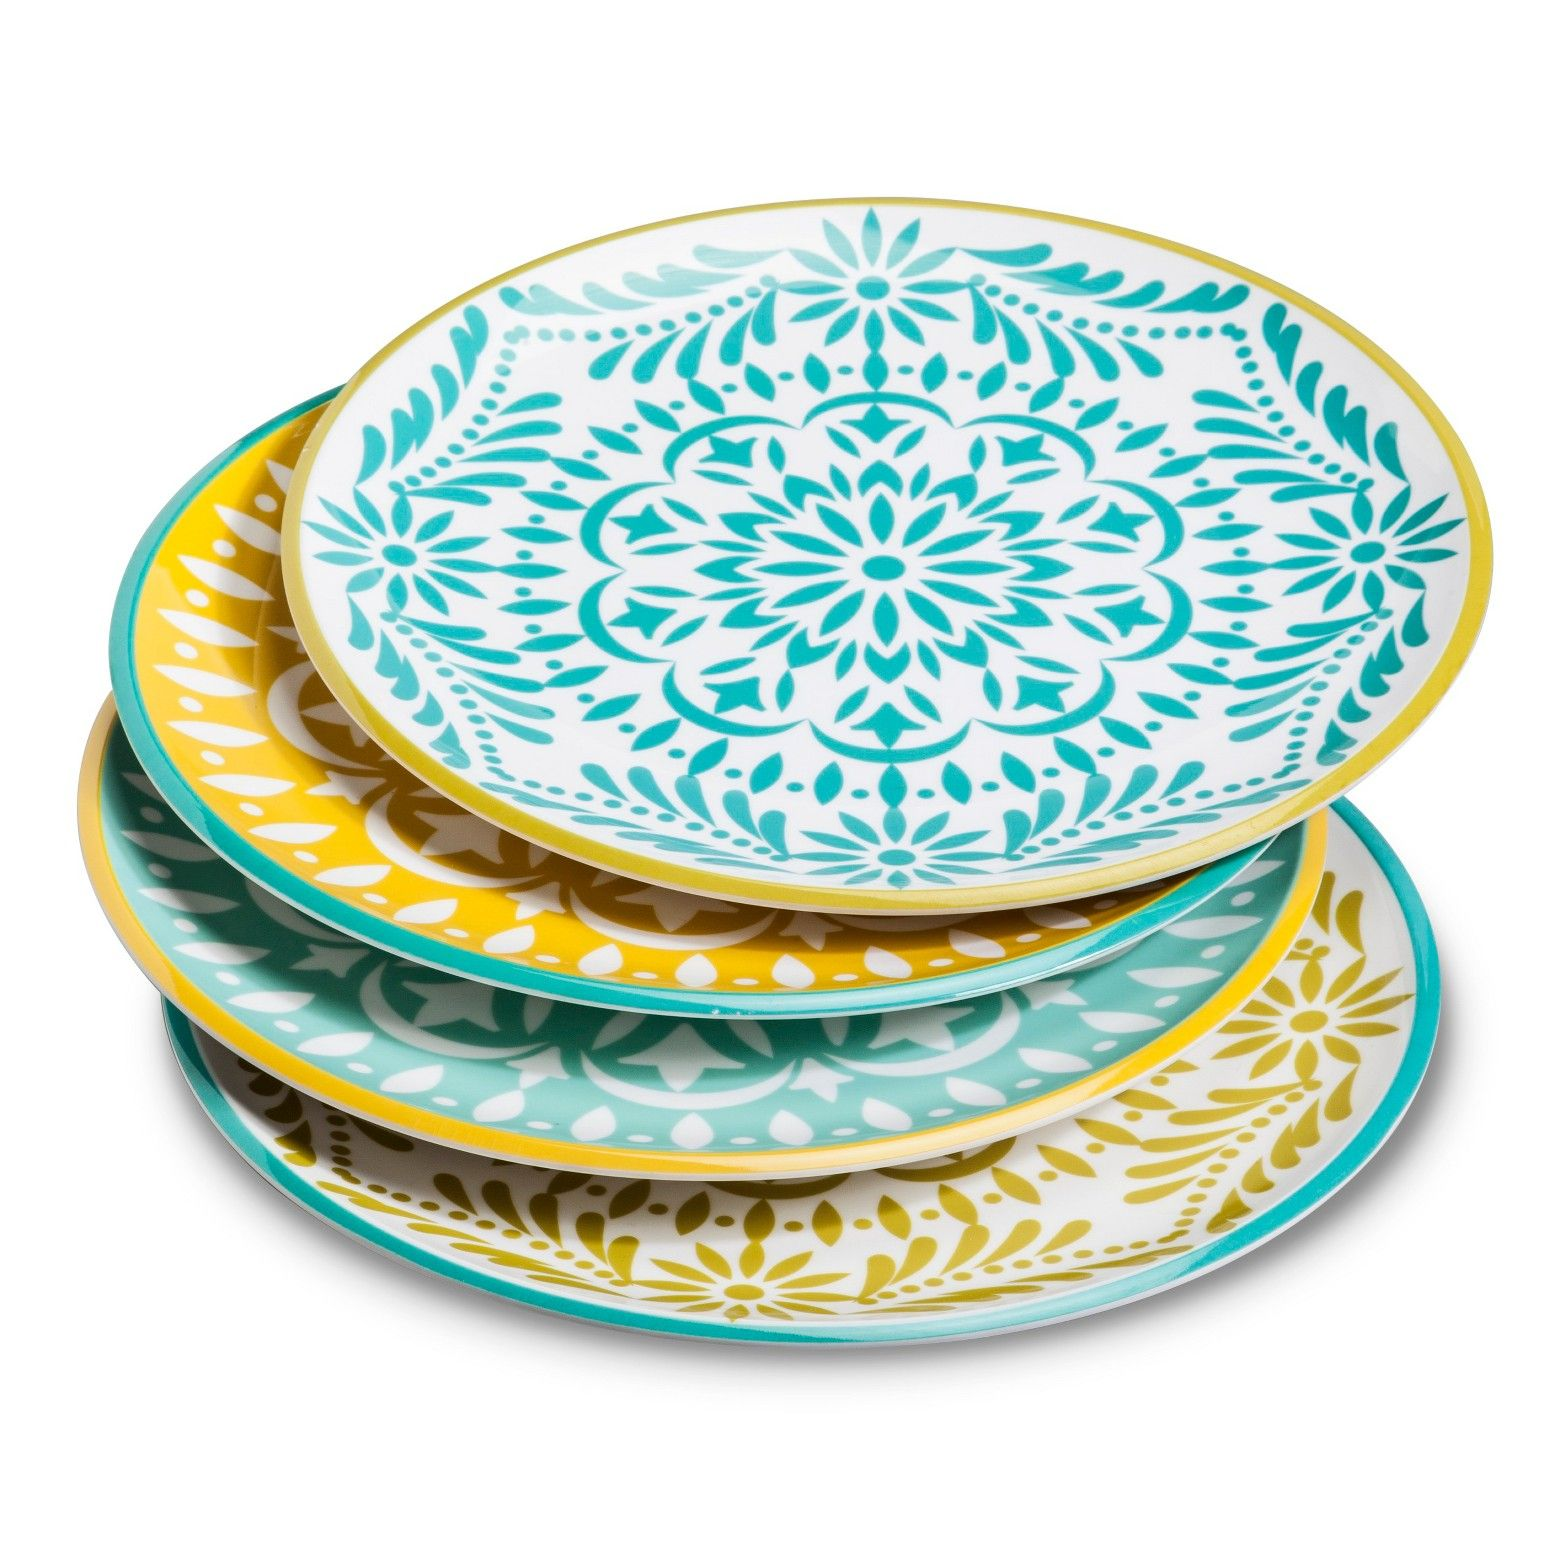 u0026bull; Durable melamineu003cbru003eu0026bull; Indoor/outdoor useu003cbru003eu0026bull; Dishwasher safeu003cbru003eu0026bull; Set of 4u003cbru003eu003cbru003eMarika Dinner Plates from Boho Boutique give your ...  sc 1 st  Pinterest & Marika Floral Melamine Assorted Dinner Plate Set 4-pc - Blue/Gold ...